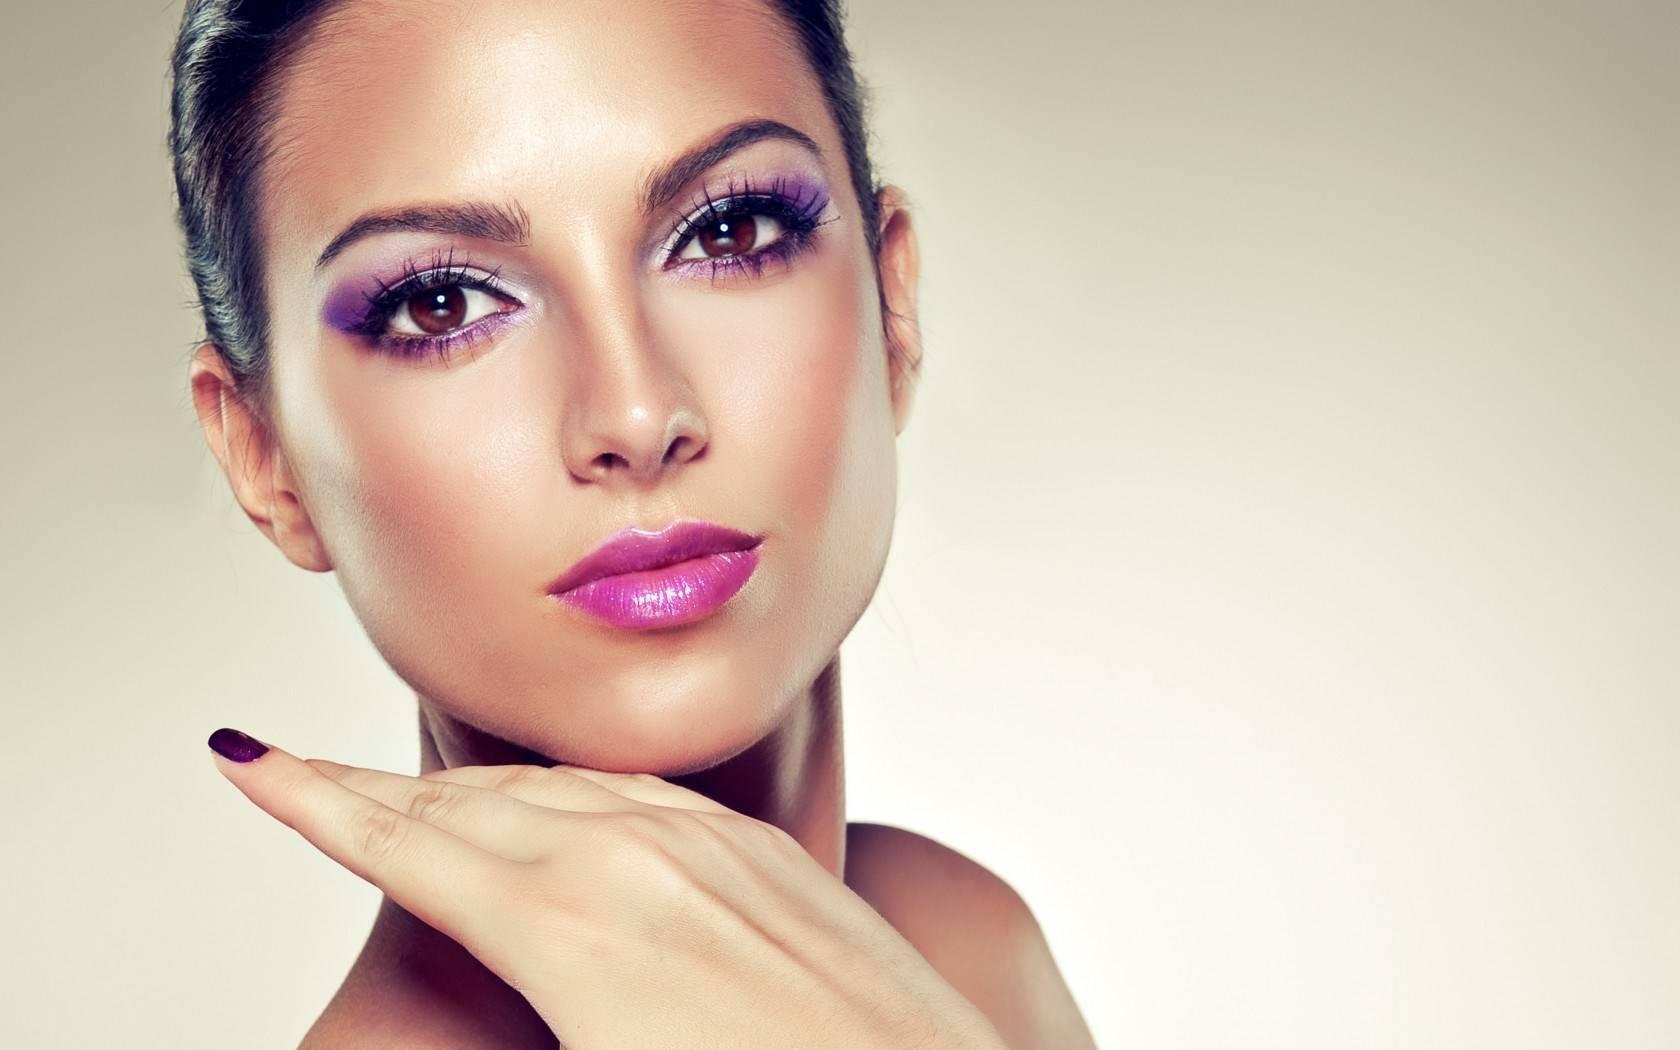 Beautiful Makeup Wallpaper